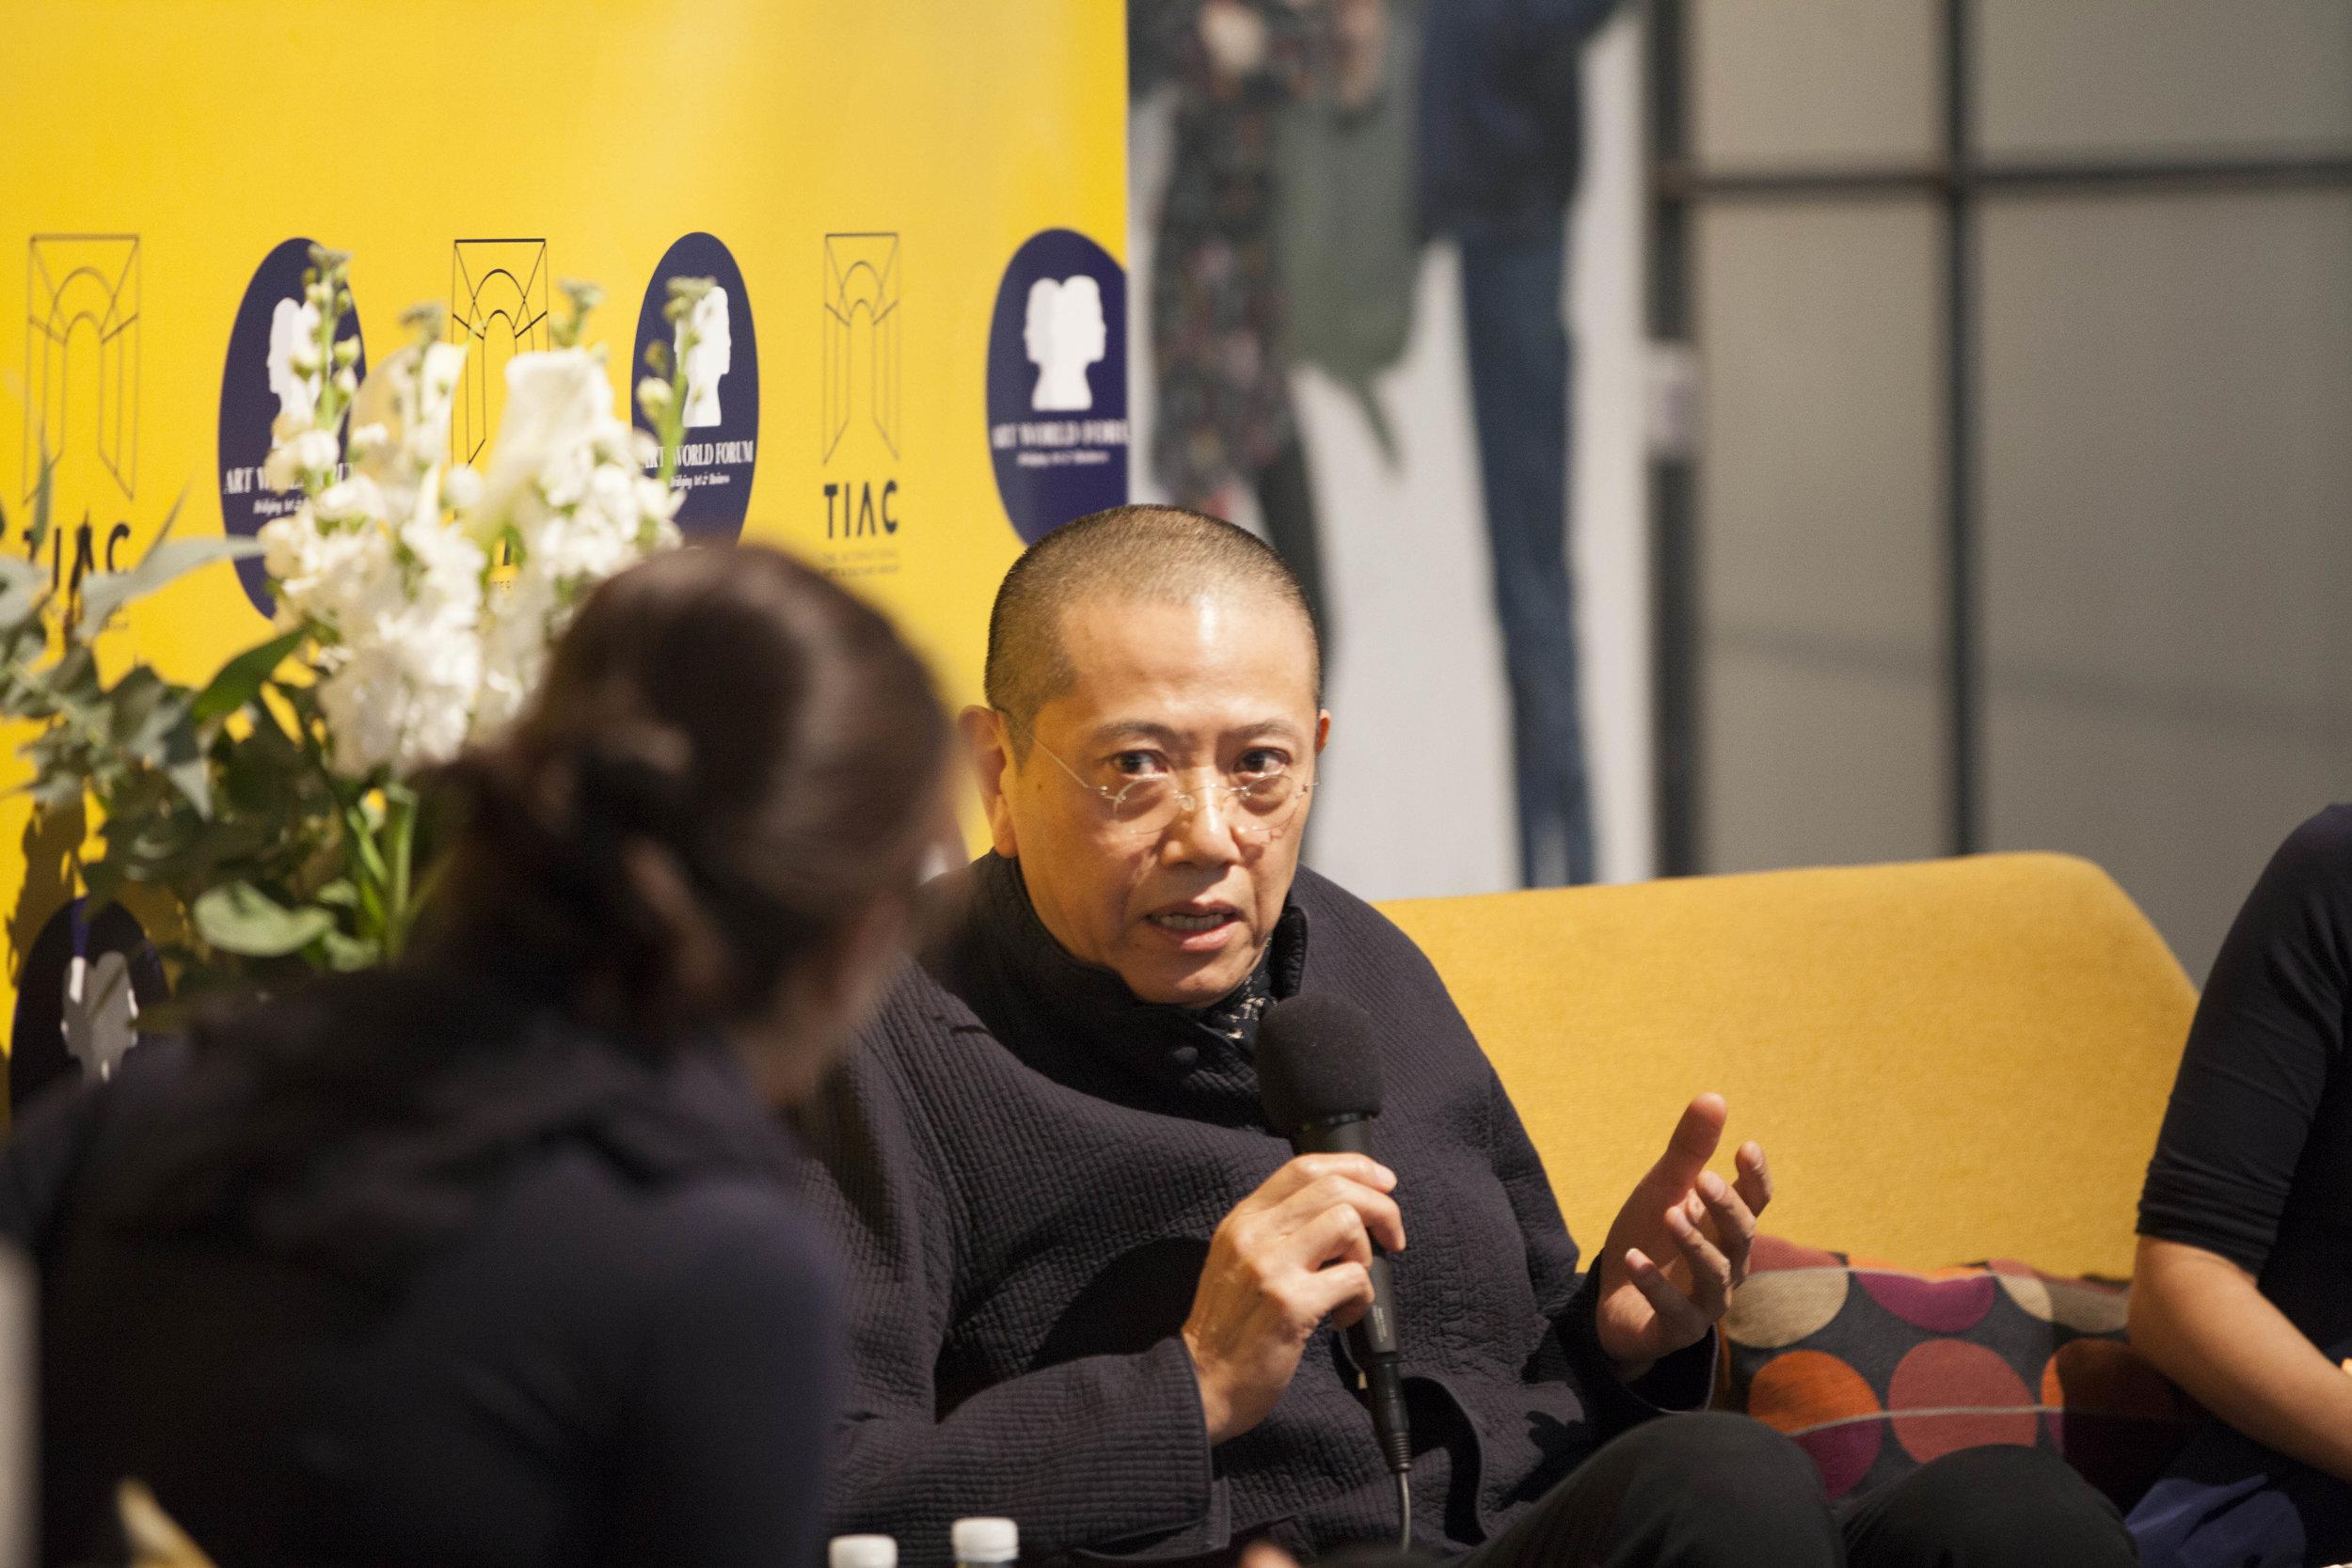 Mr. Chen Danqing